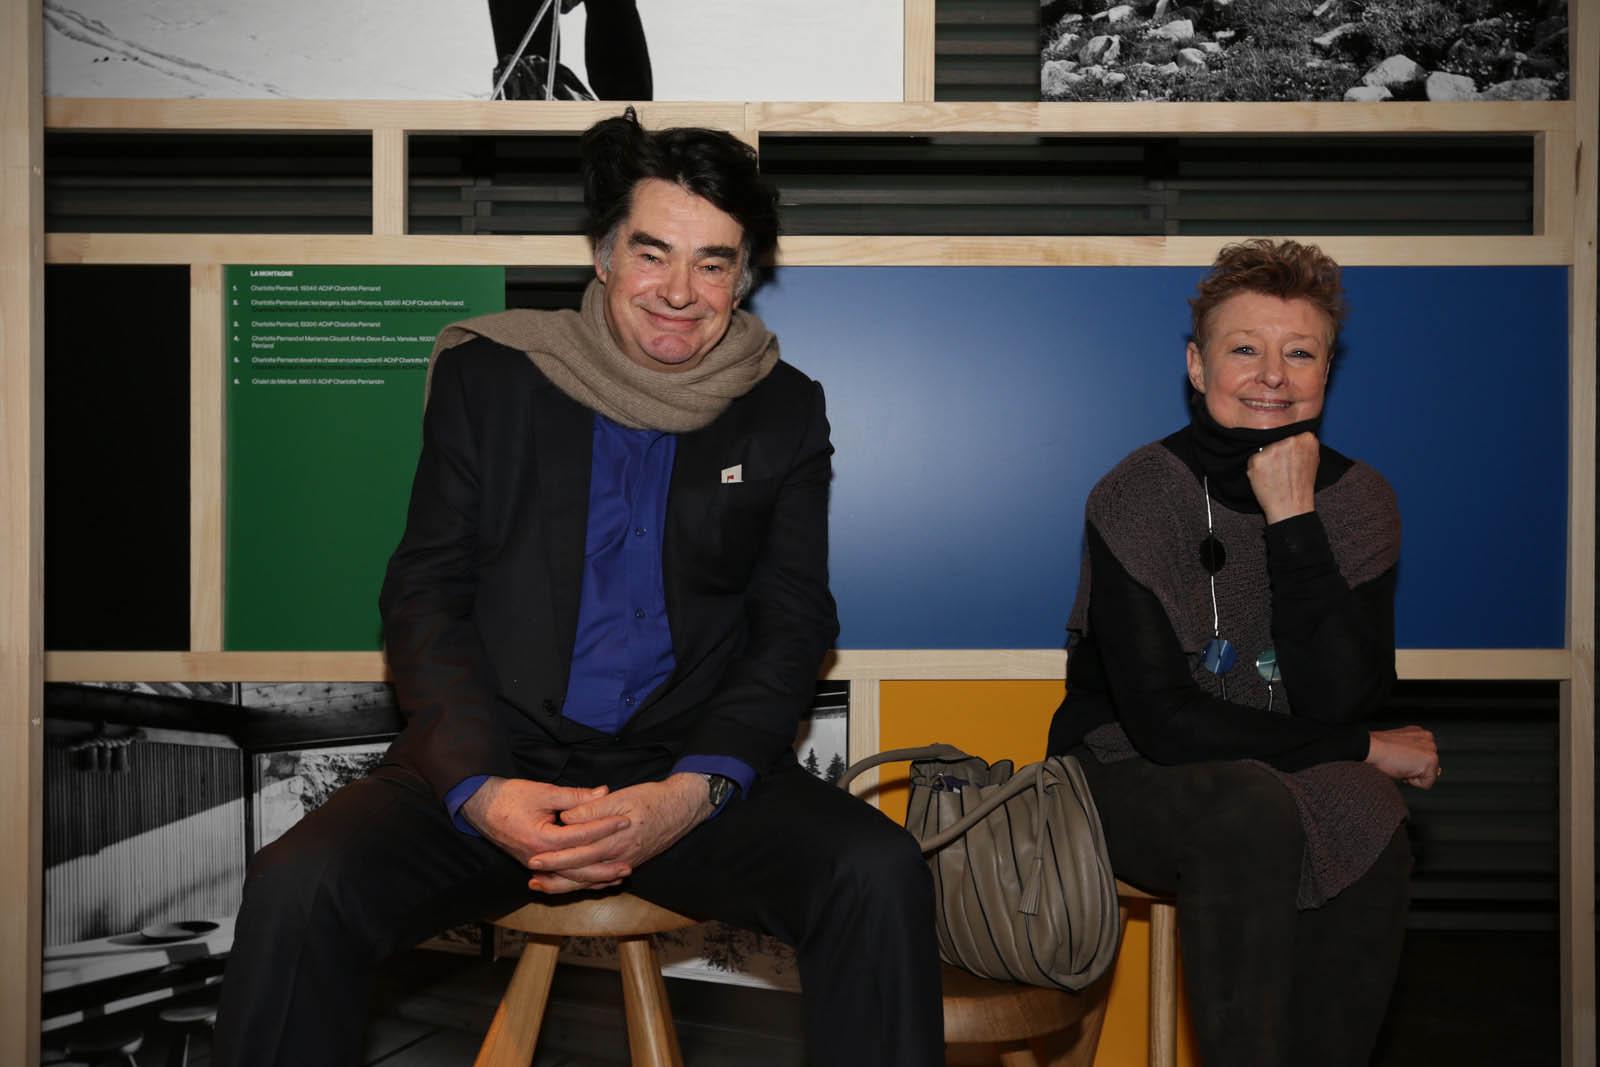 Pernette Perriand-Barsac and Jacques Barsac